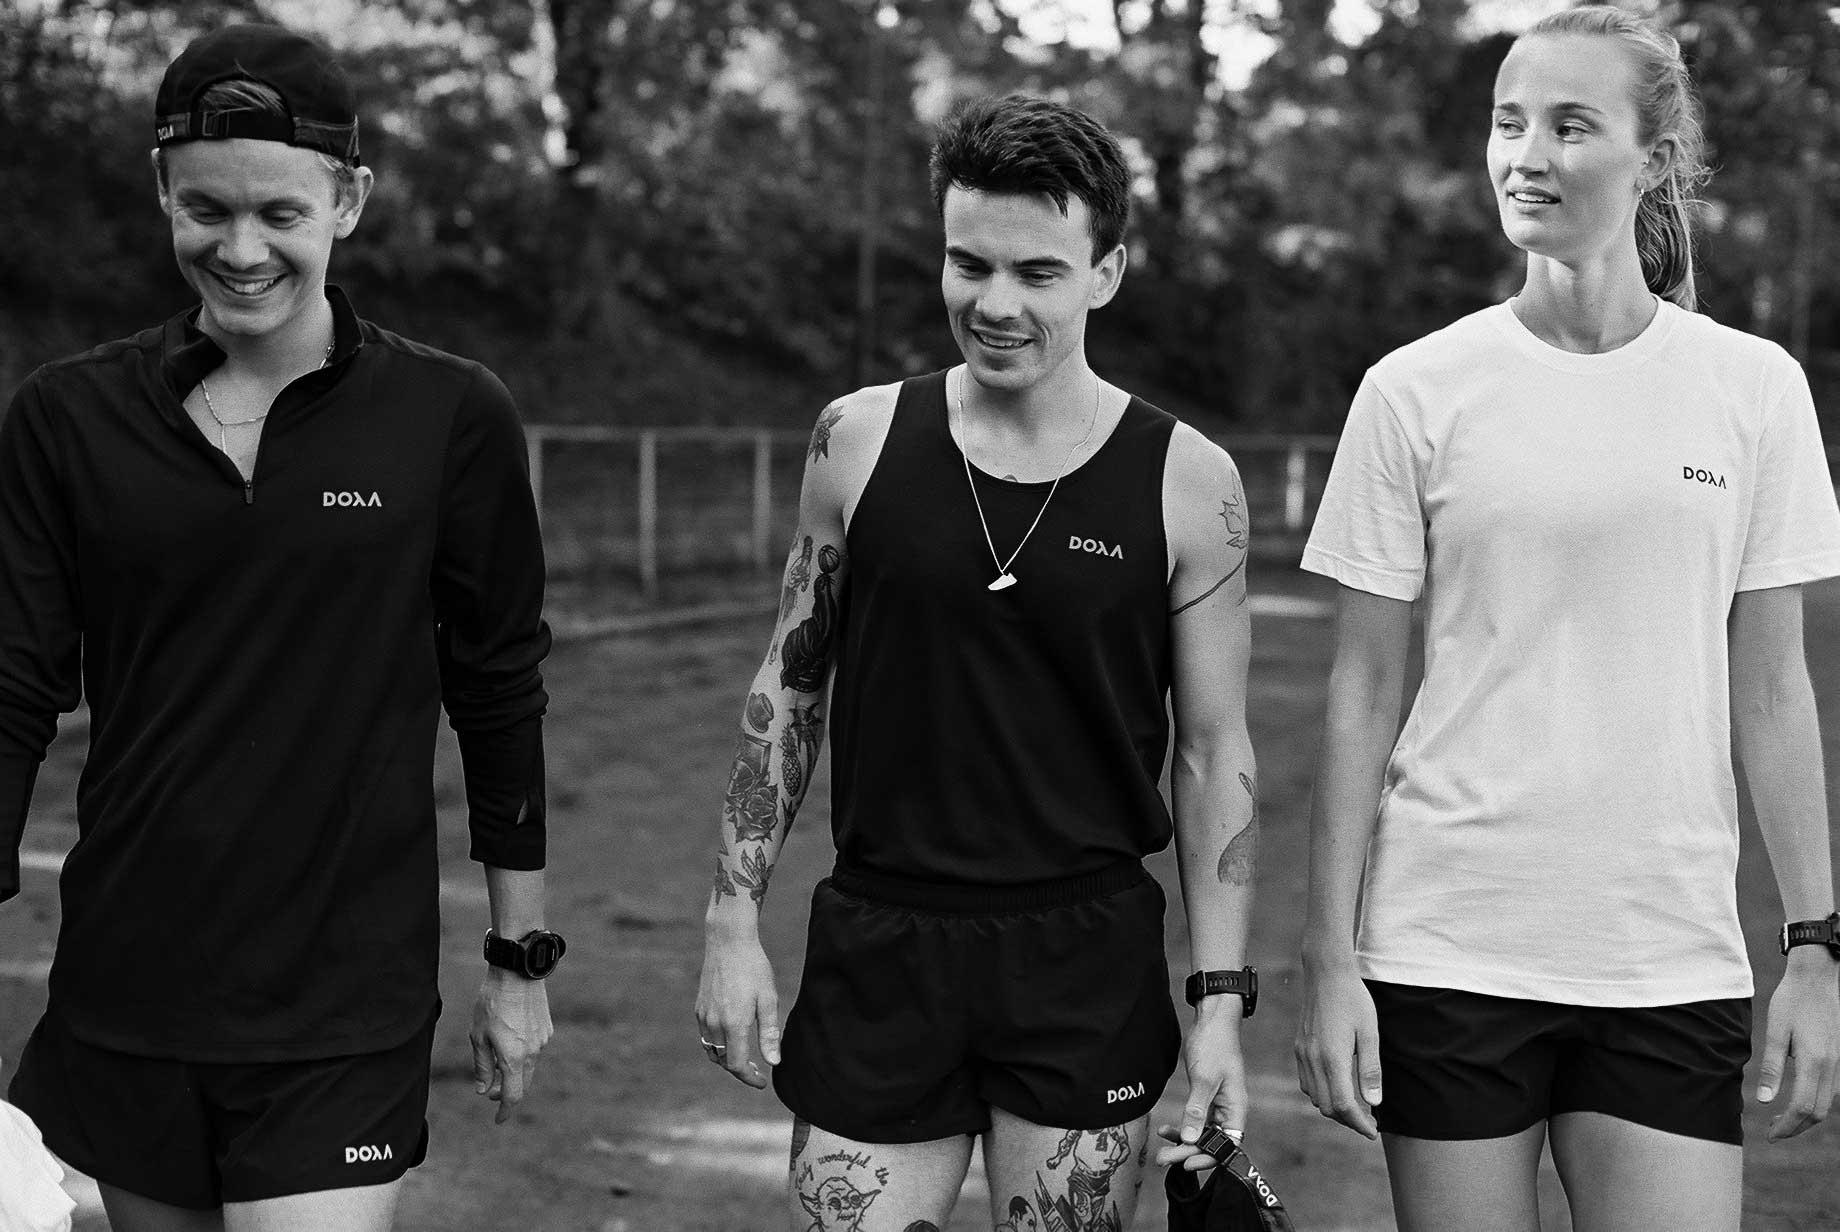 DOXA run OFFTRACK campaign with Metal Health Club